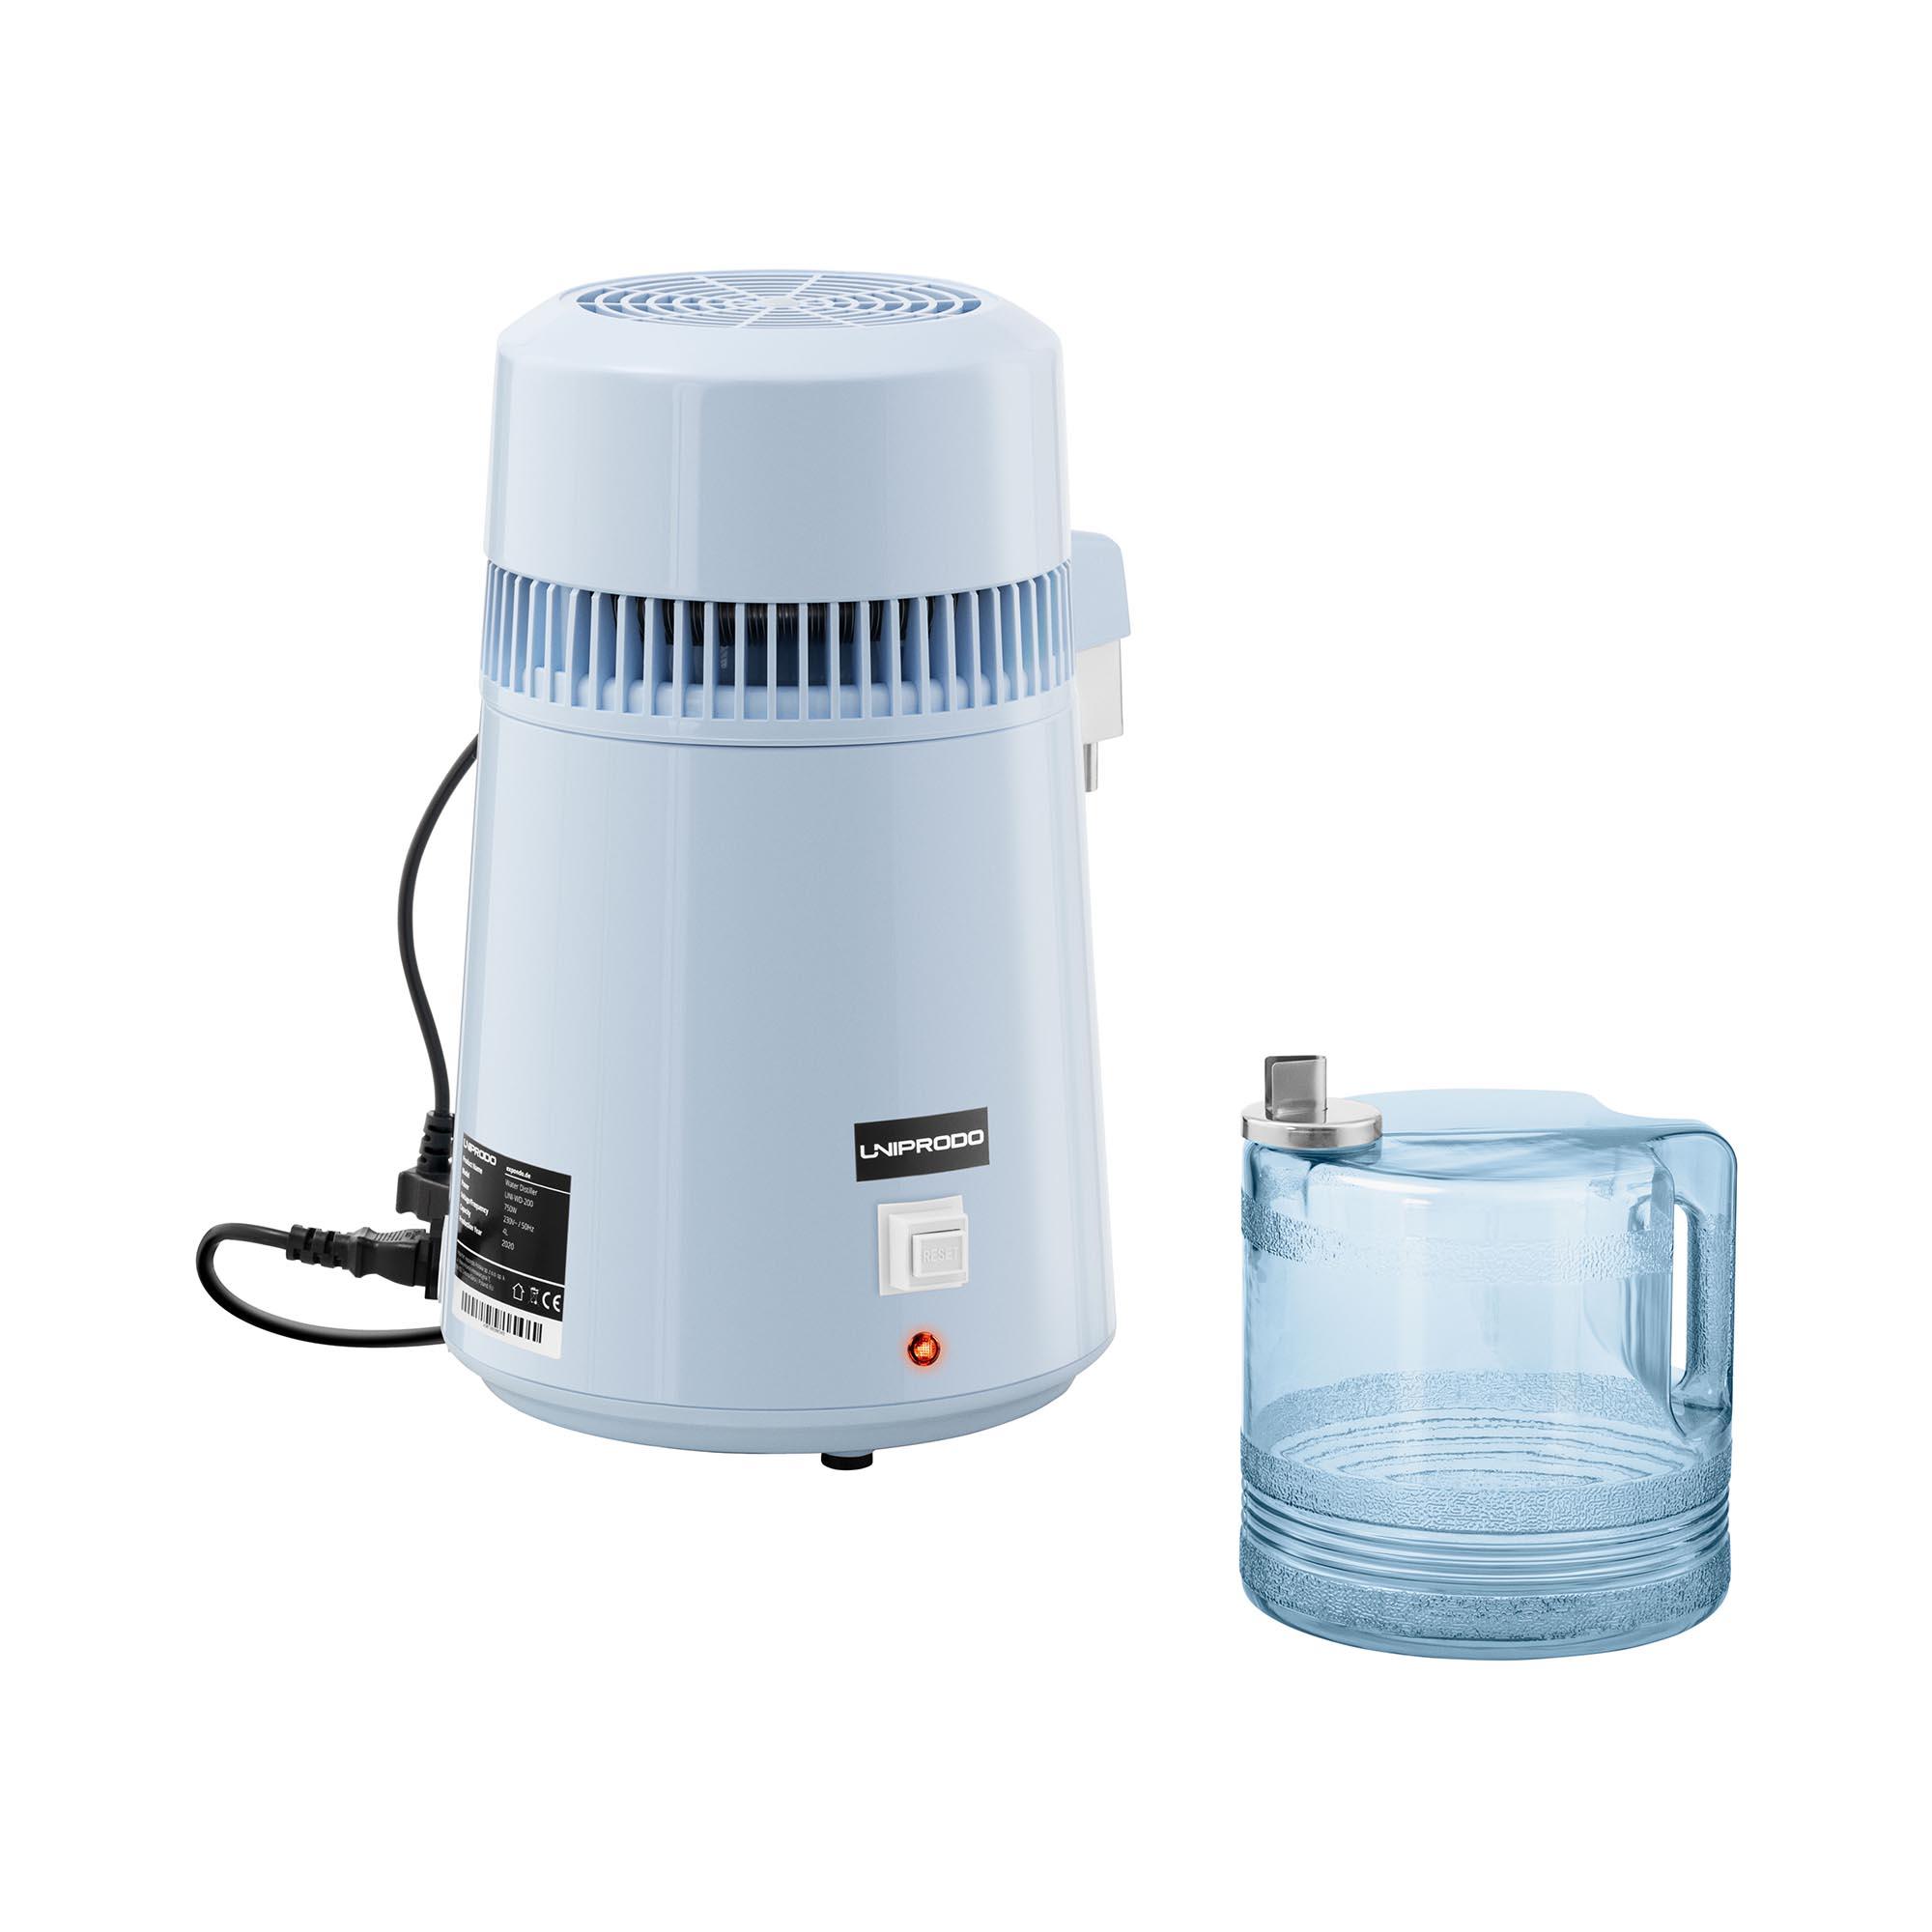 Uniprodo Destilliergerät - Wasser - 4 L 10250466